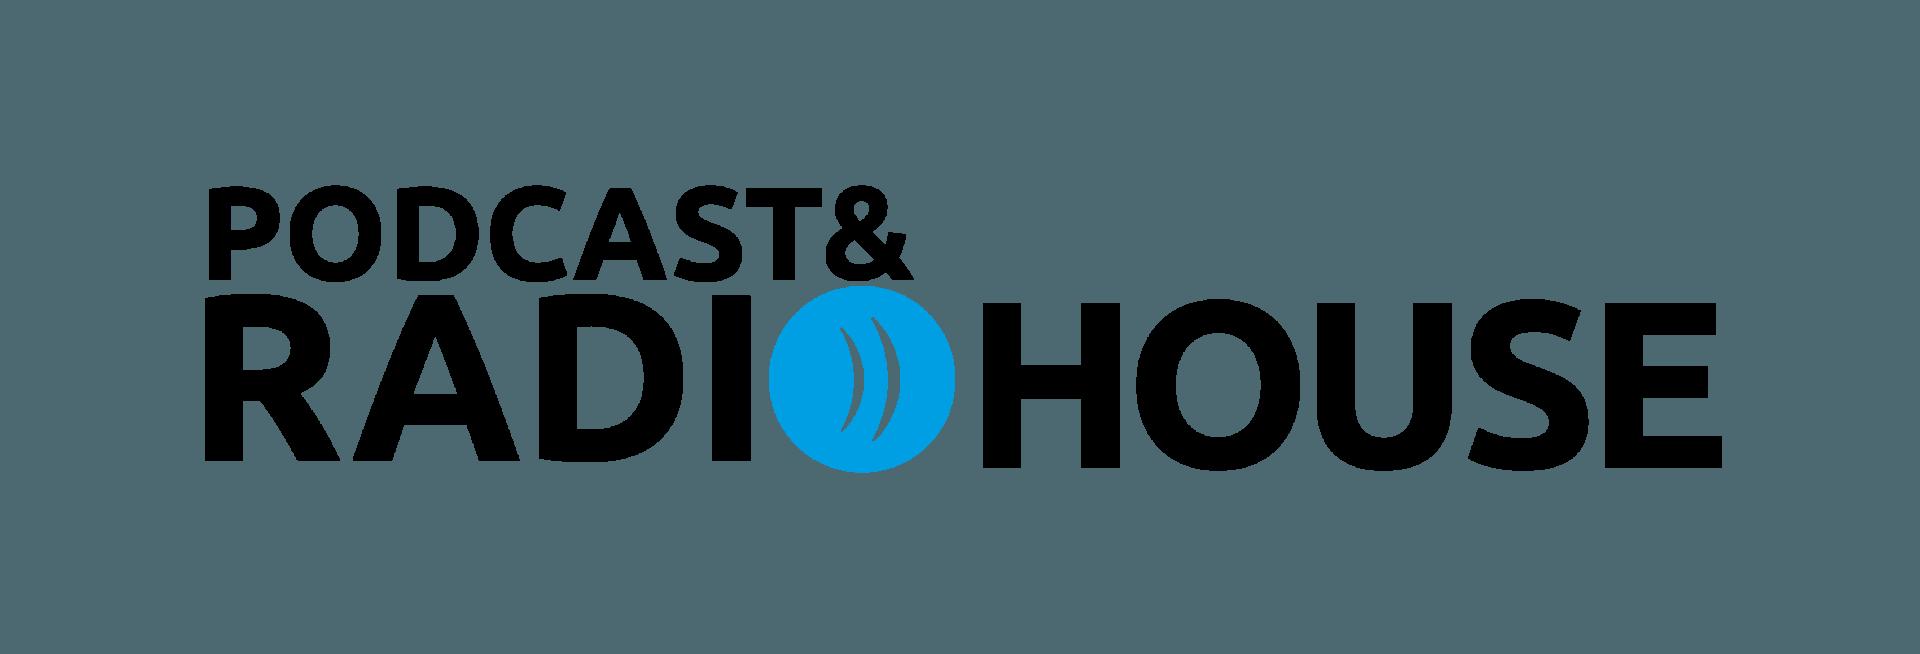 Podcast & Radio House - Maison de la Radio et du Podcast - Location de  studio de podcast